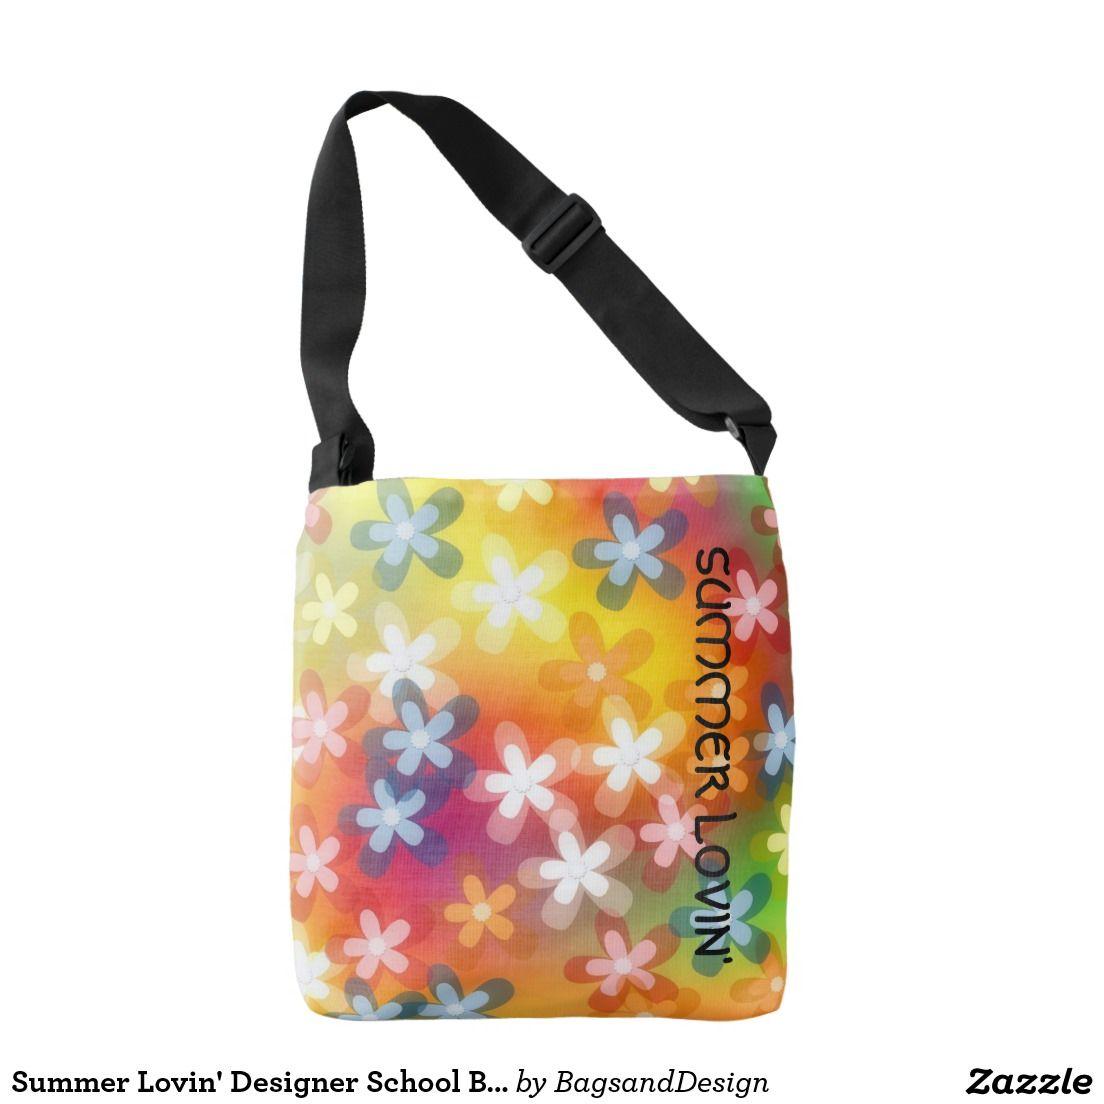 15 % OFF Happy Kiids Schoolbags by Marijke Verkerk Design. Feel Good Fashion & Living® www.marijkeverkerkdesign.nl